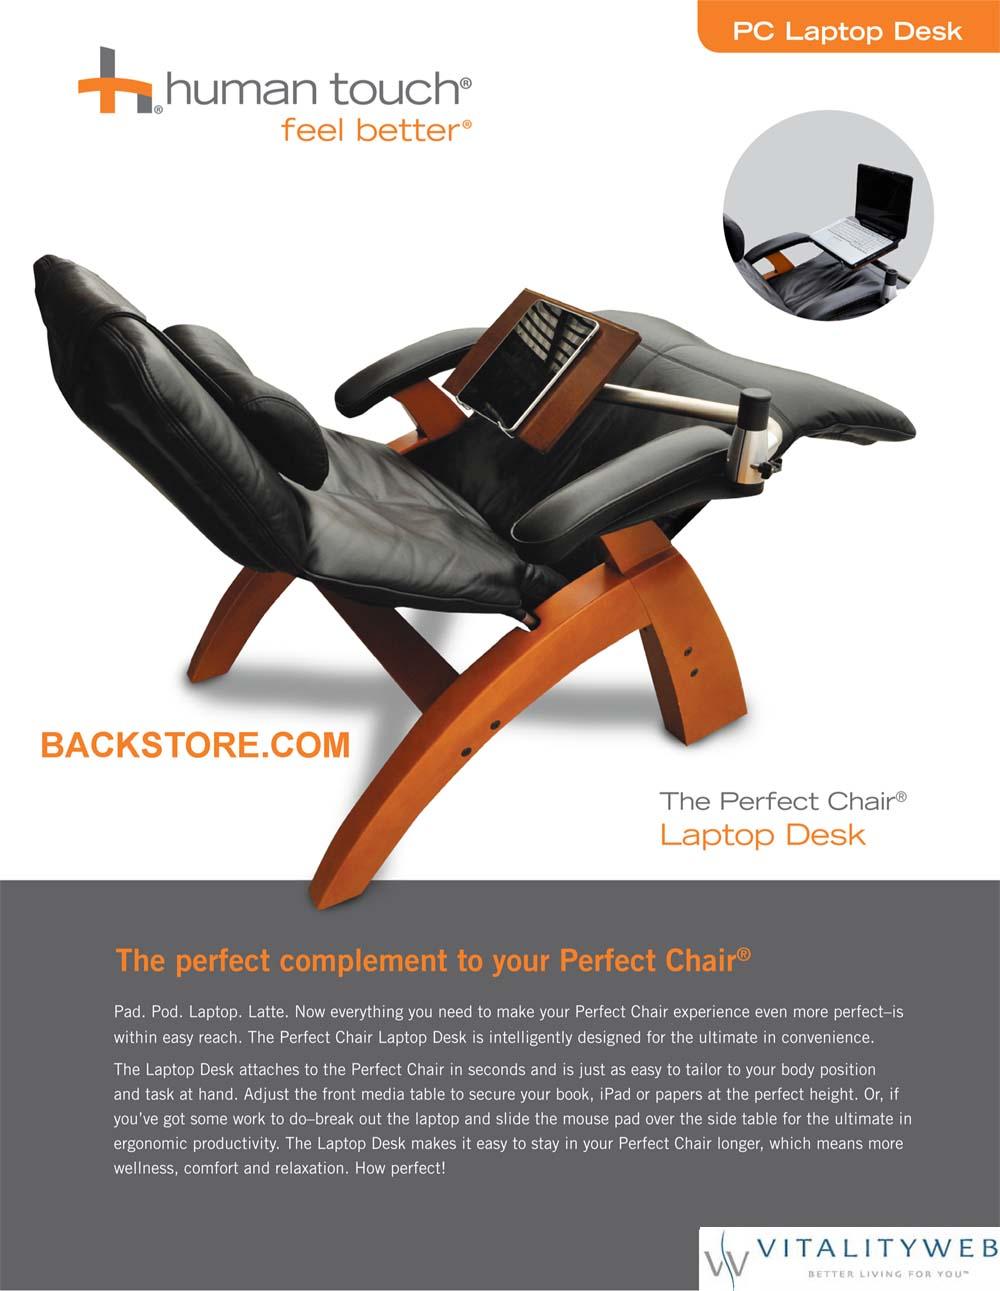 Etonnant Stressless Recliner Chair And Ottoman From Ekornes, Human ...